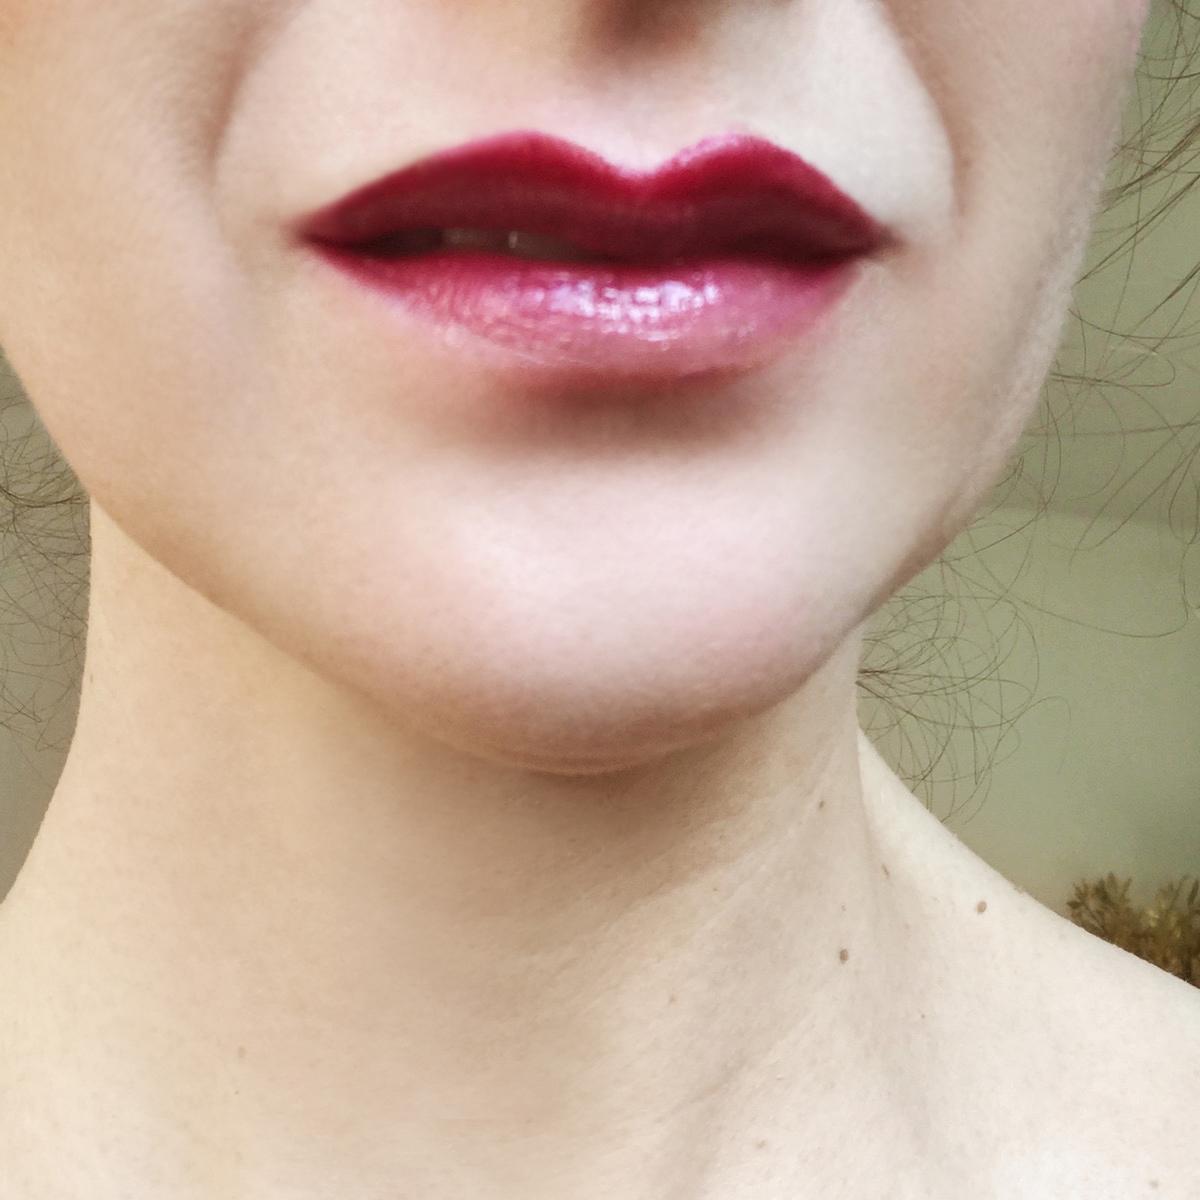 Avon mark ombre lips